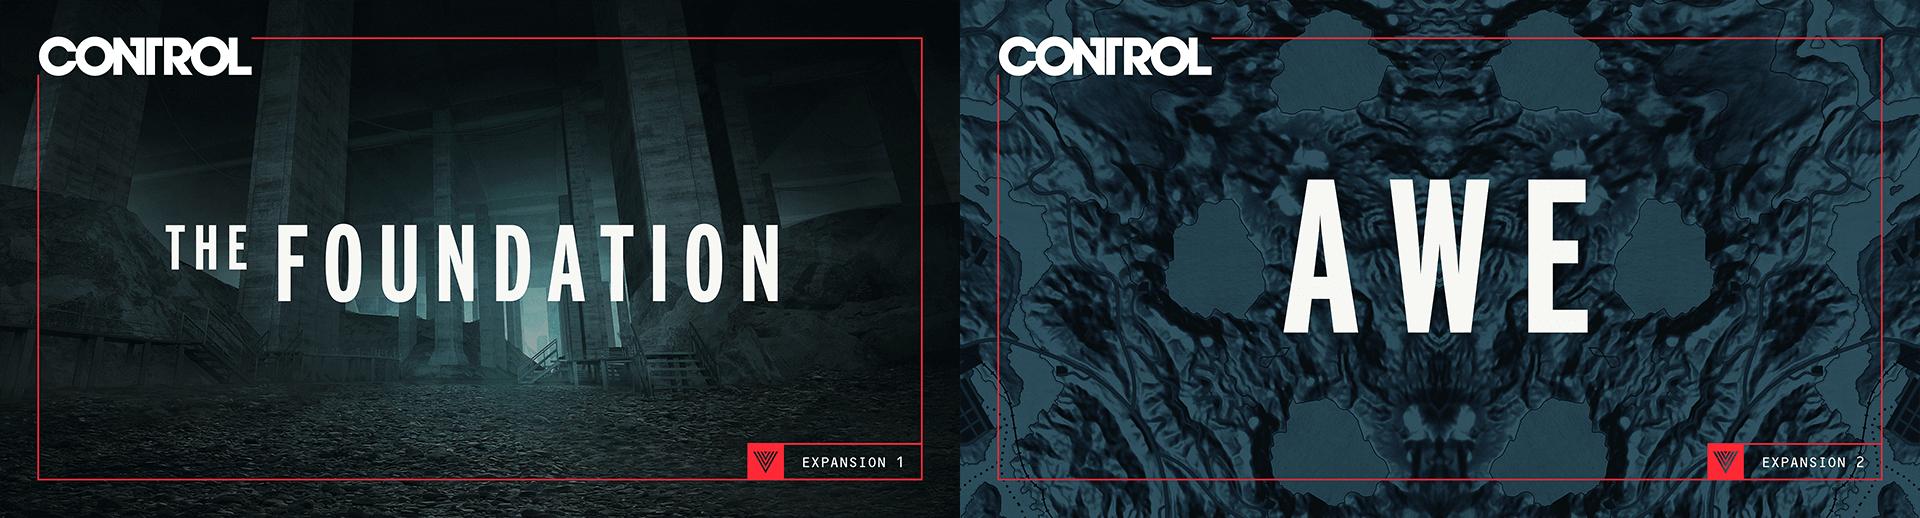 Control - Foundation & Expansion